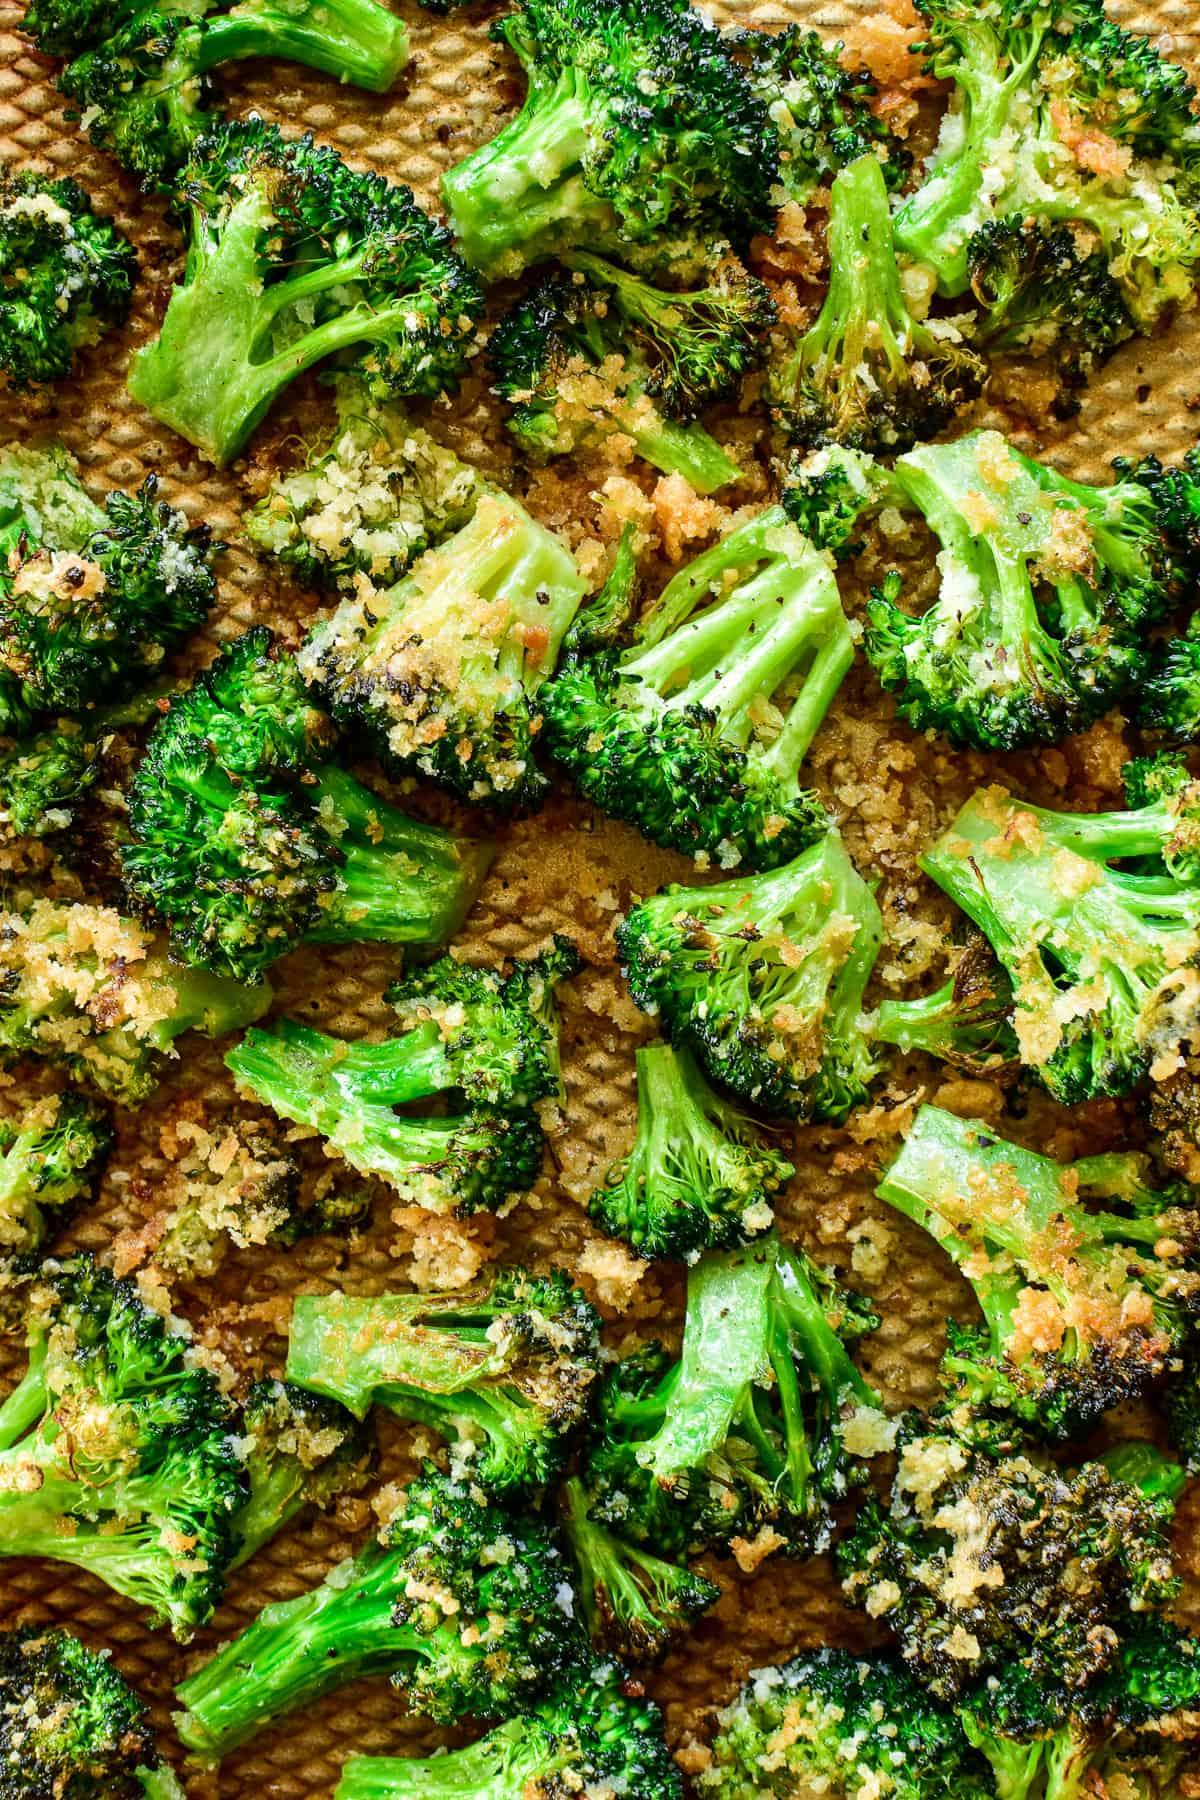 Parmesan Roasted Broccoli on a baking sheet